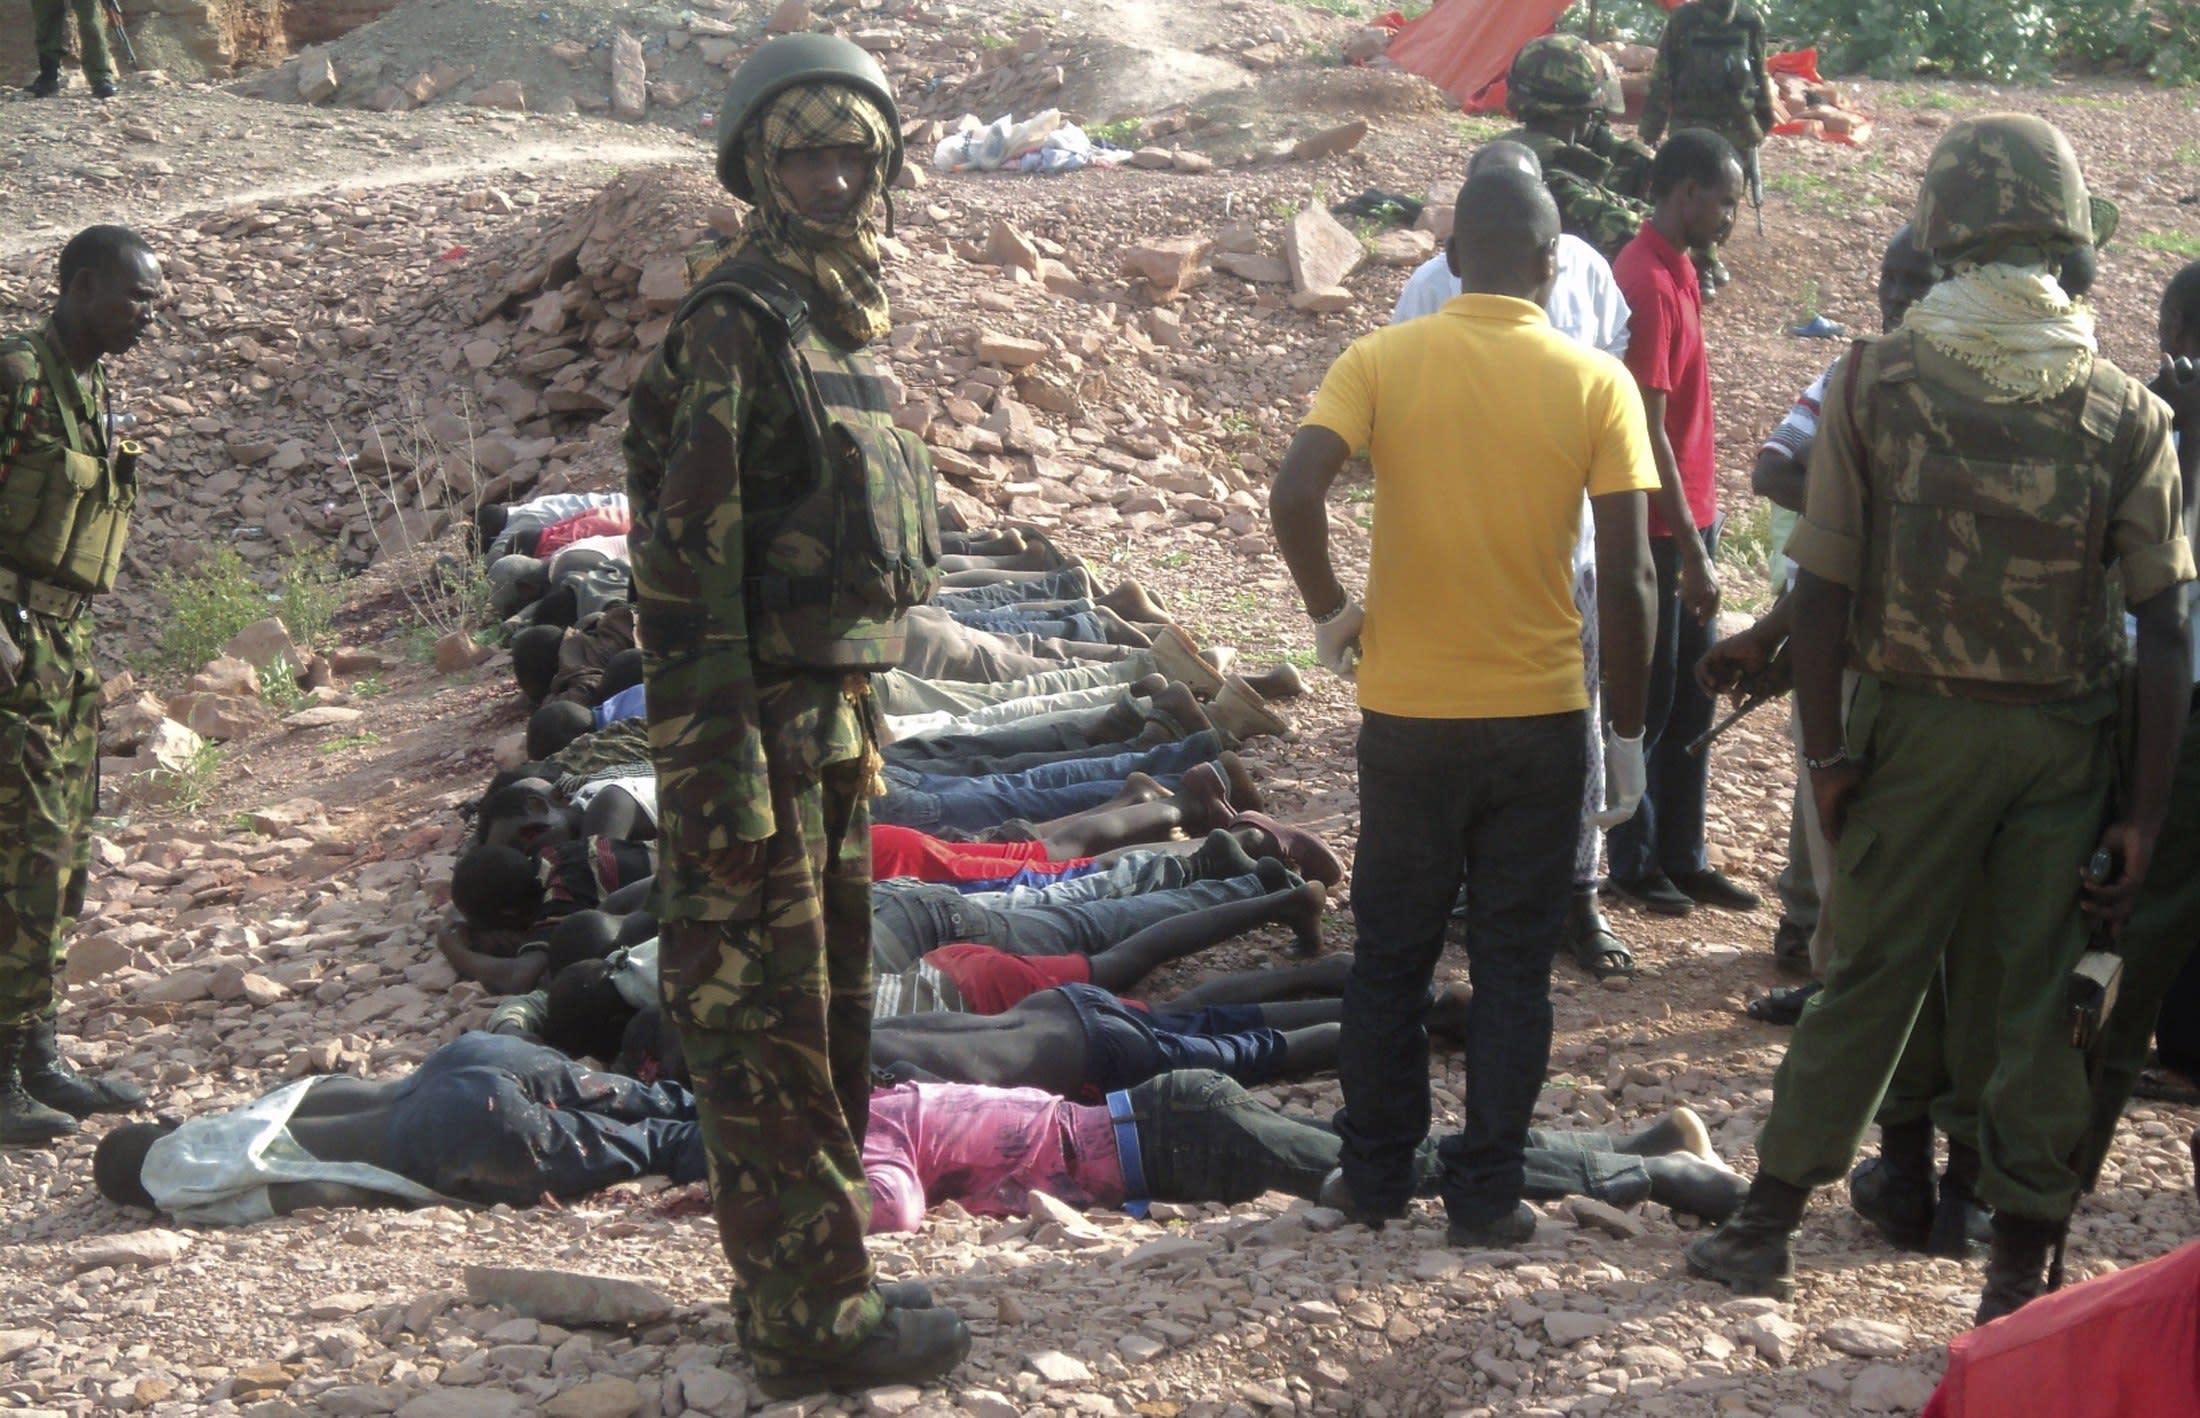 Somali militants kill two men accused of rape, al Shabaab